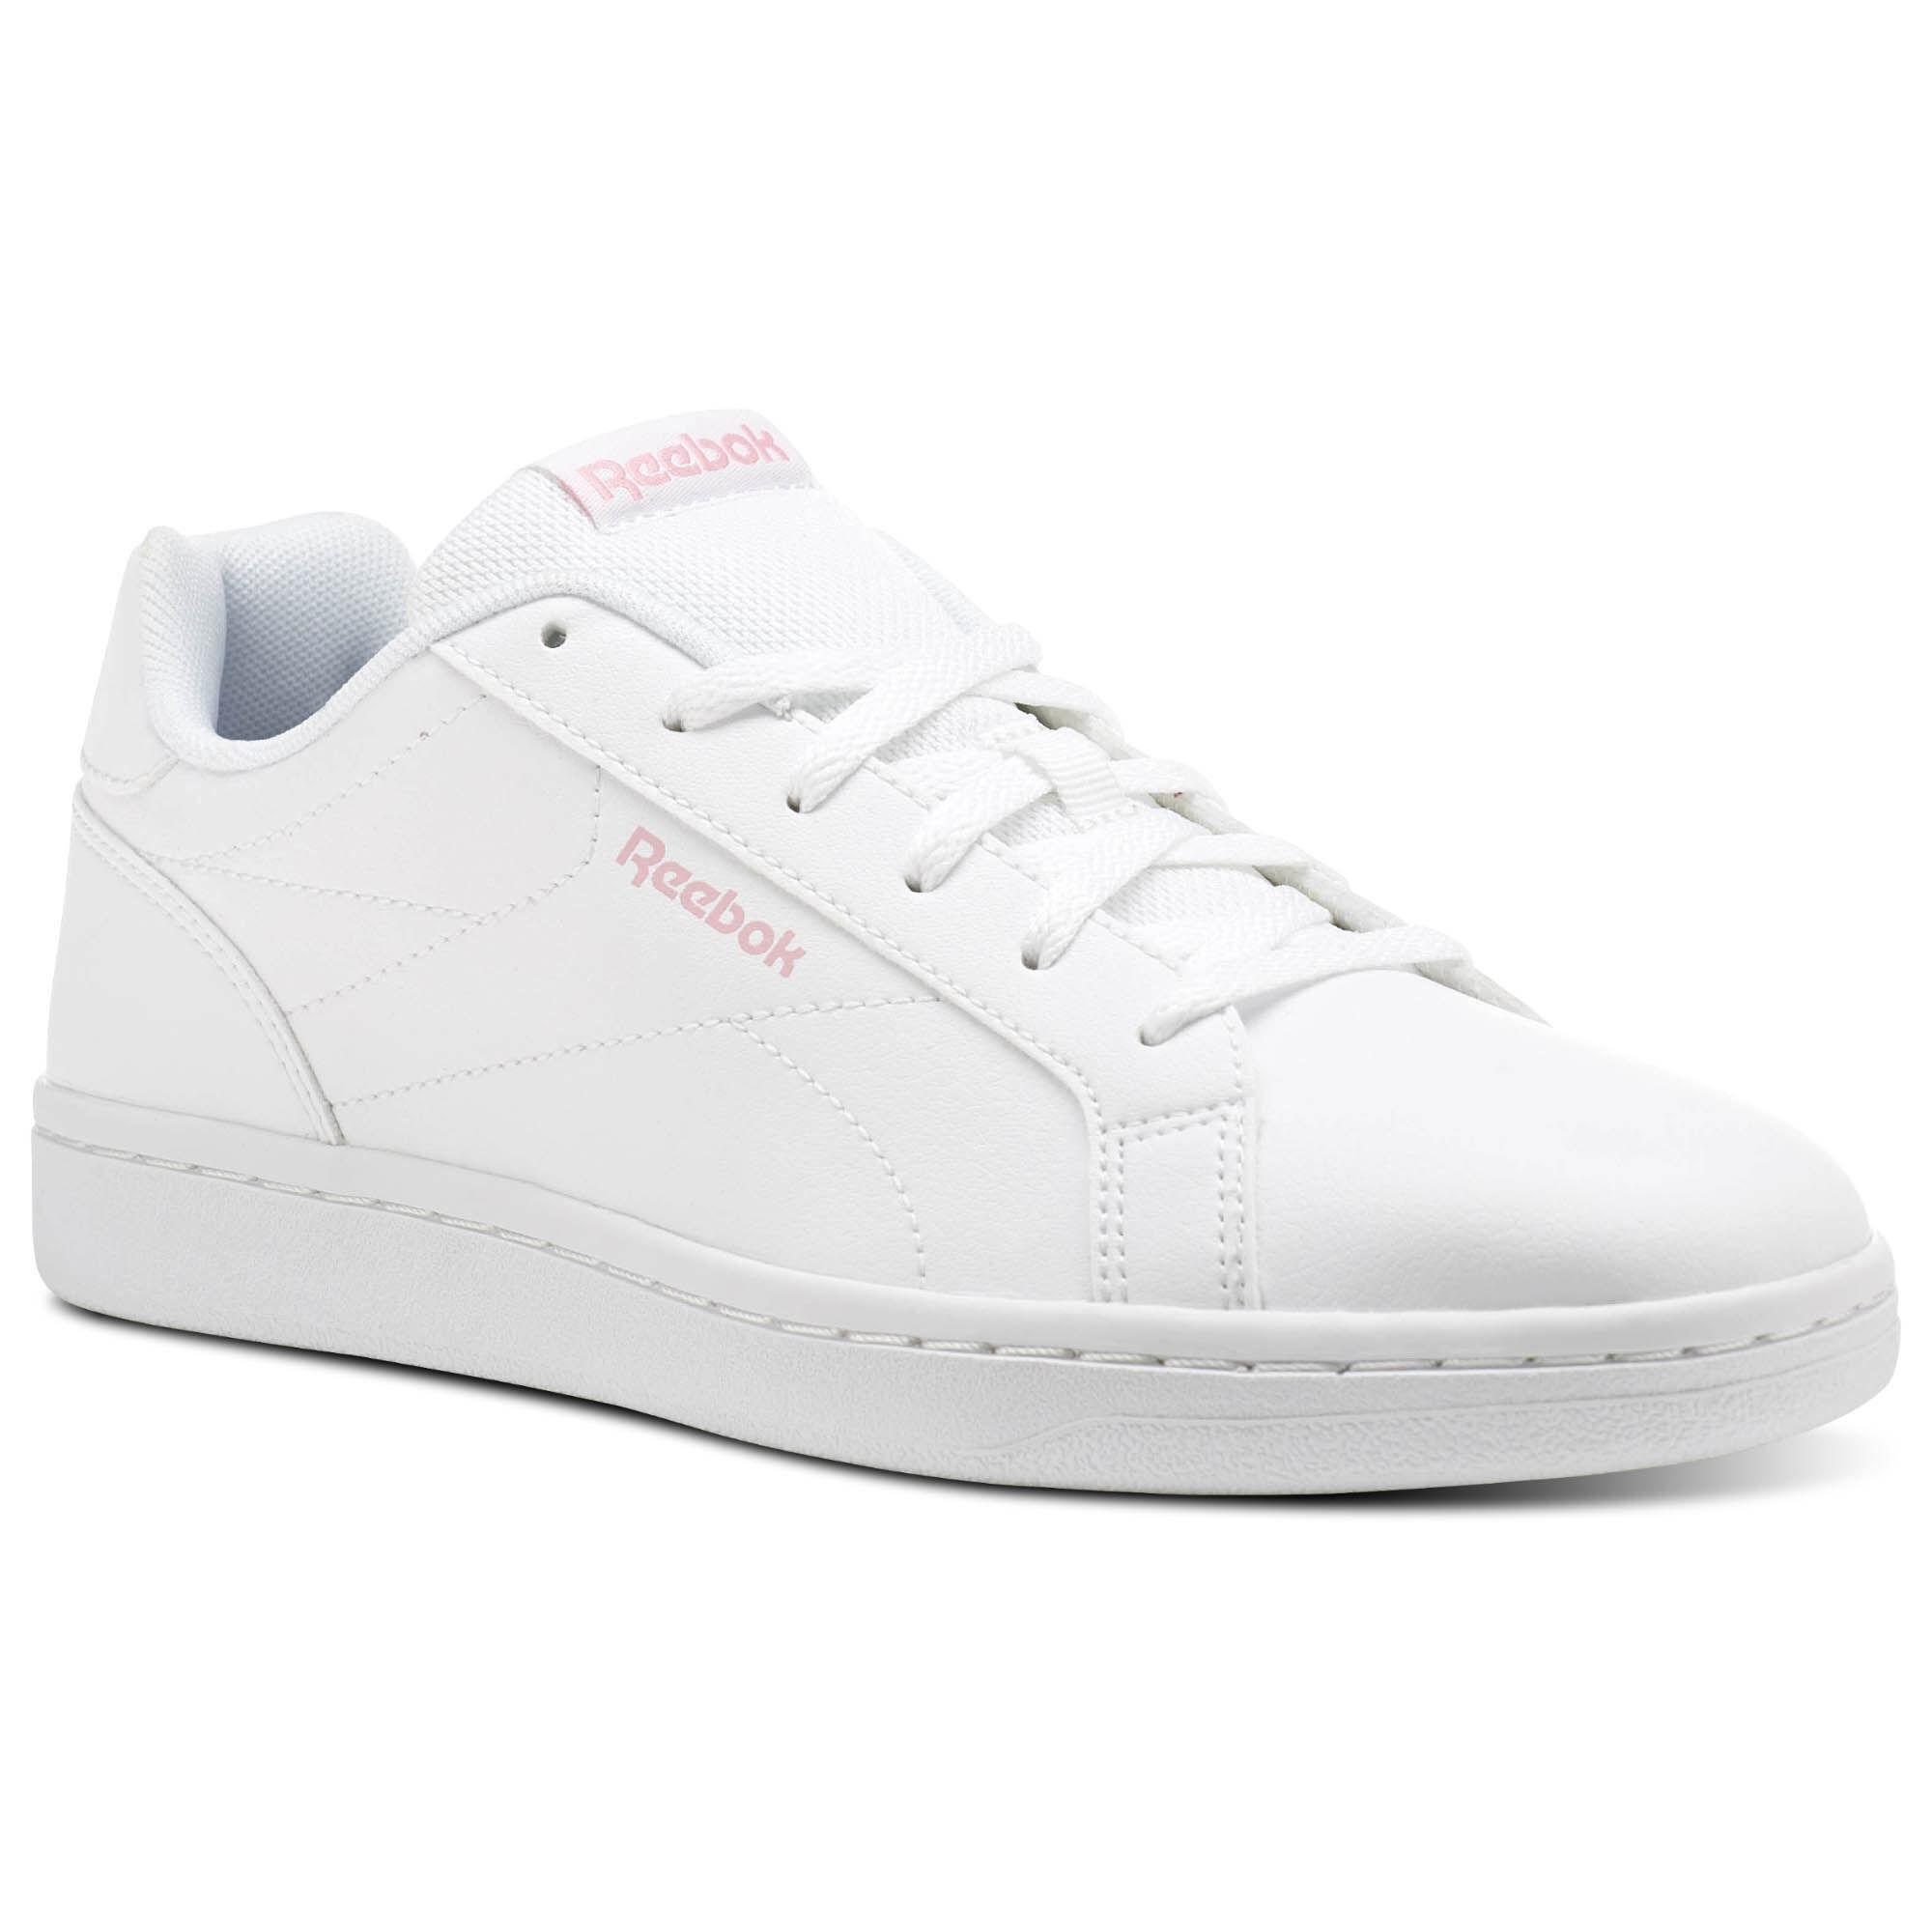 Reebok - Reebok Royal Complete Clean White/Light Pink CN0463